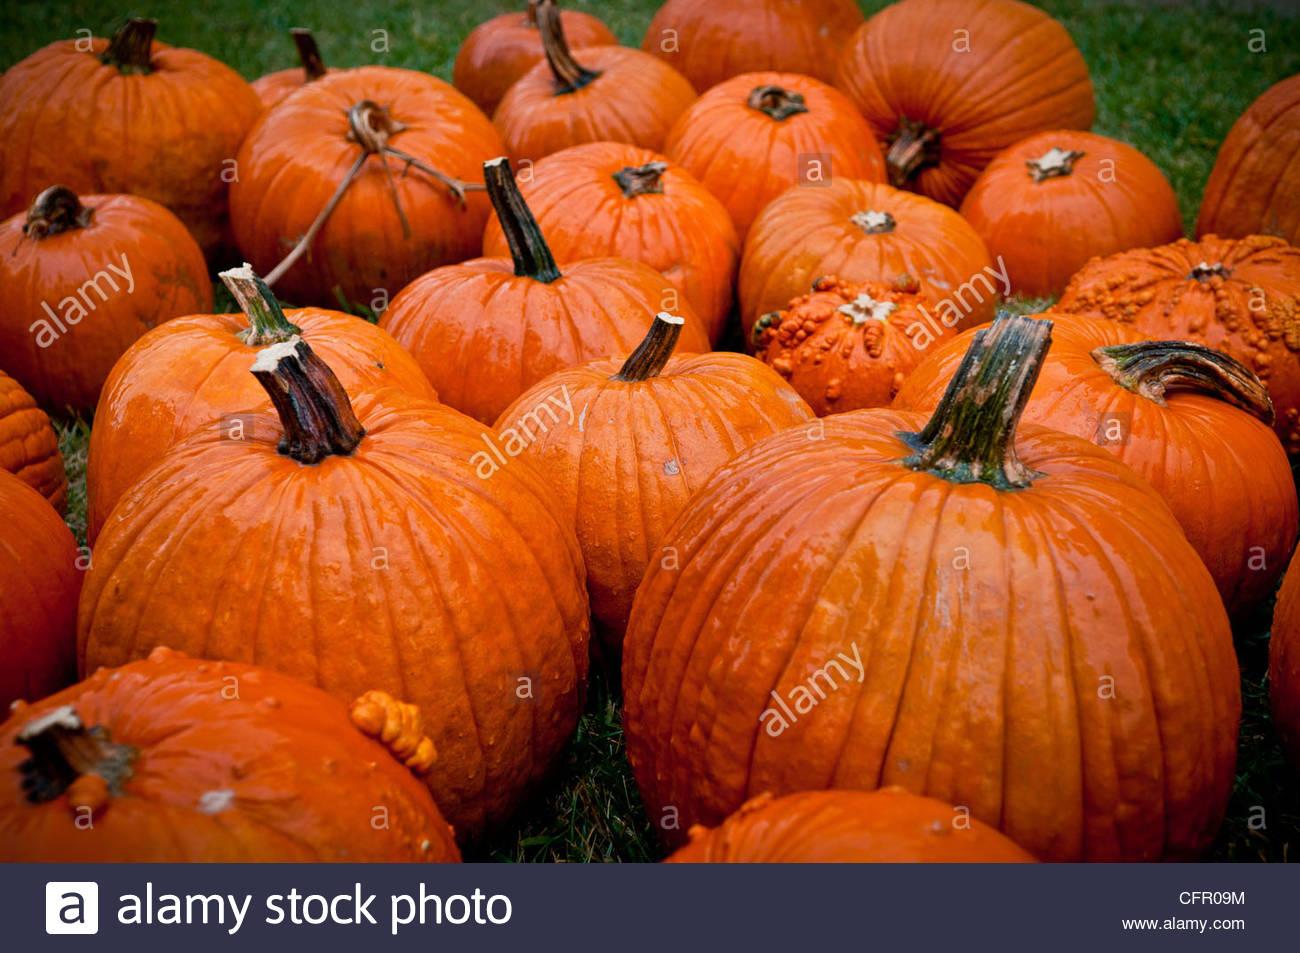 Pumpkins for Halloween, Wichita, KS, Oct 9, 2011 - Stock Image